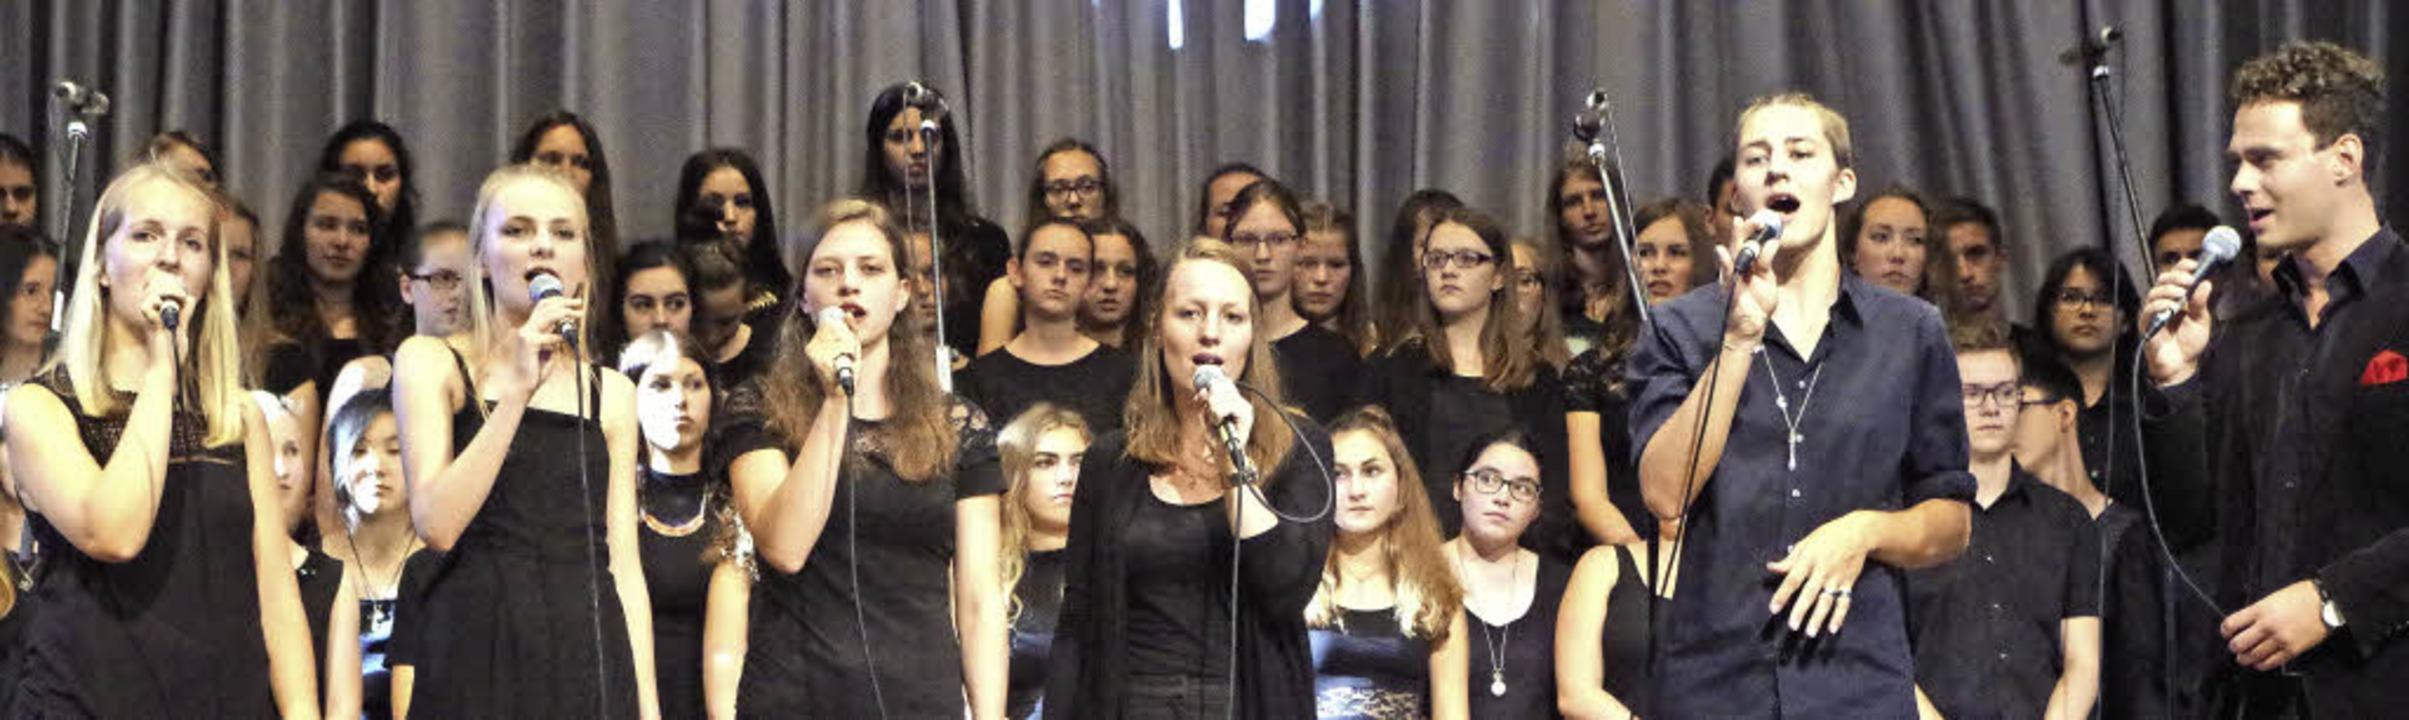 Perfekt aufeinander abgestimmt: Das A-Cappella-Ensemble  | Foto: Katharina Bächle